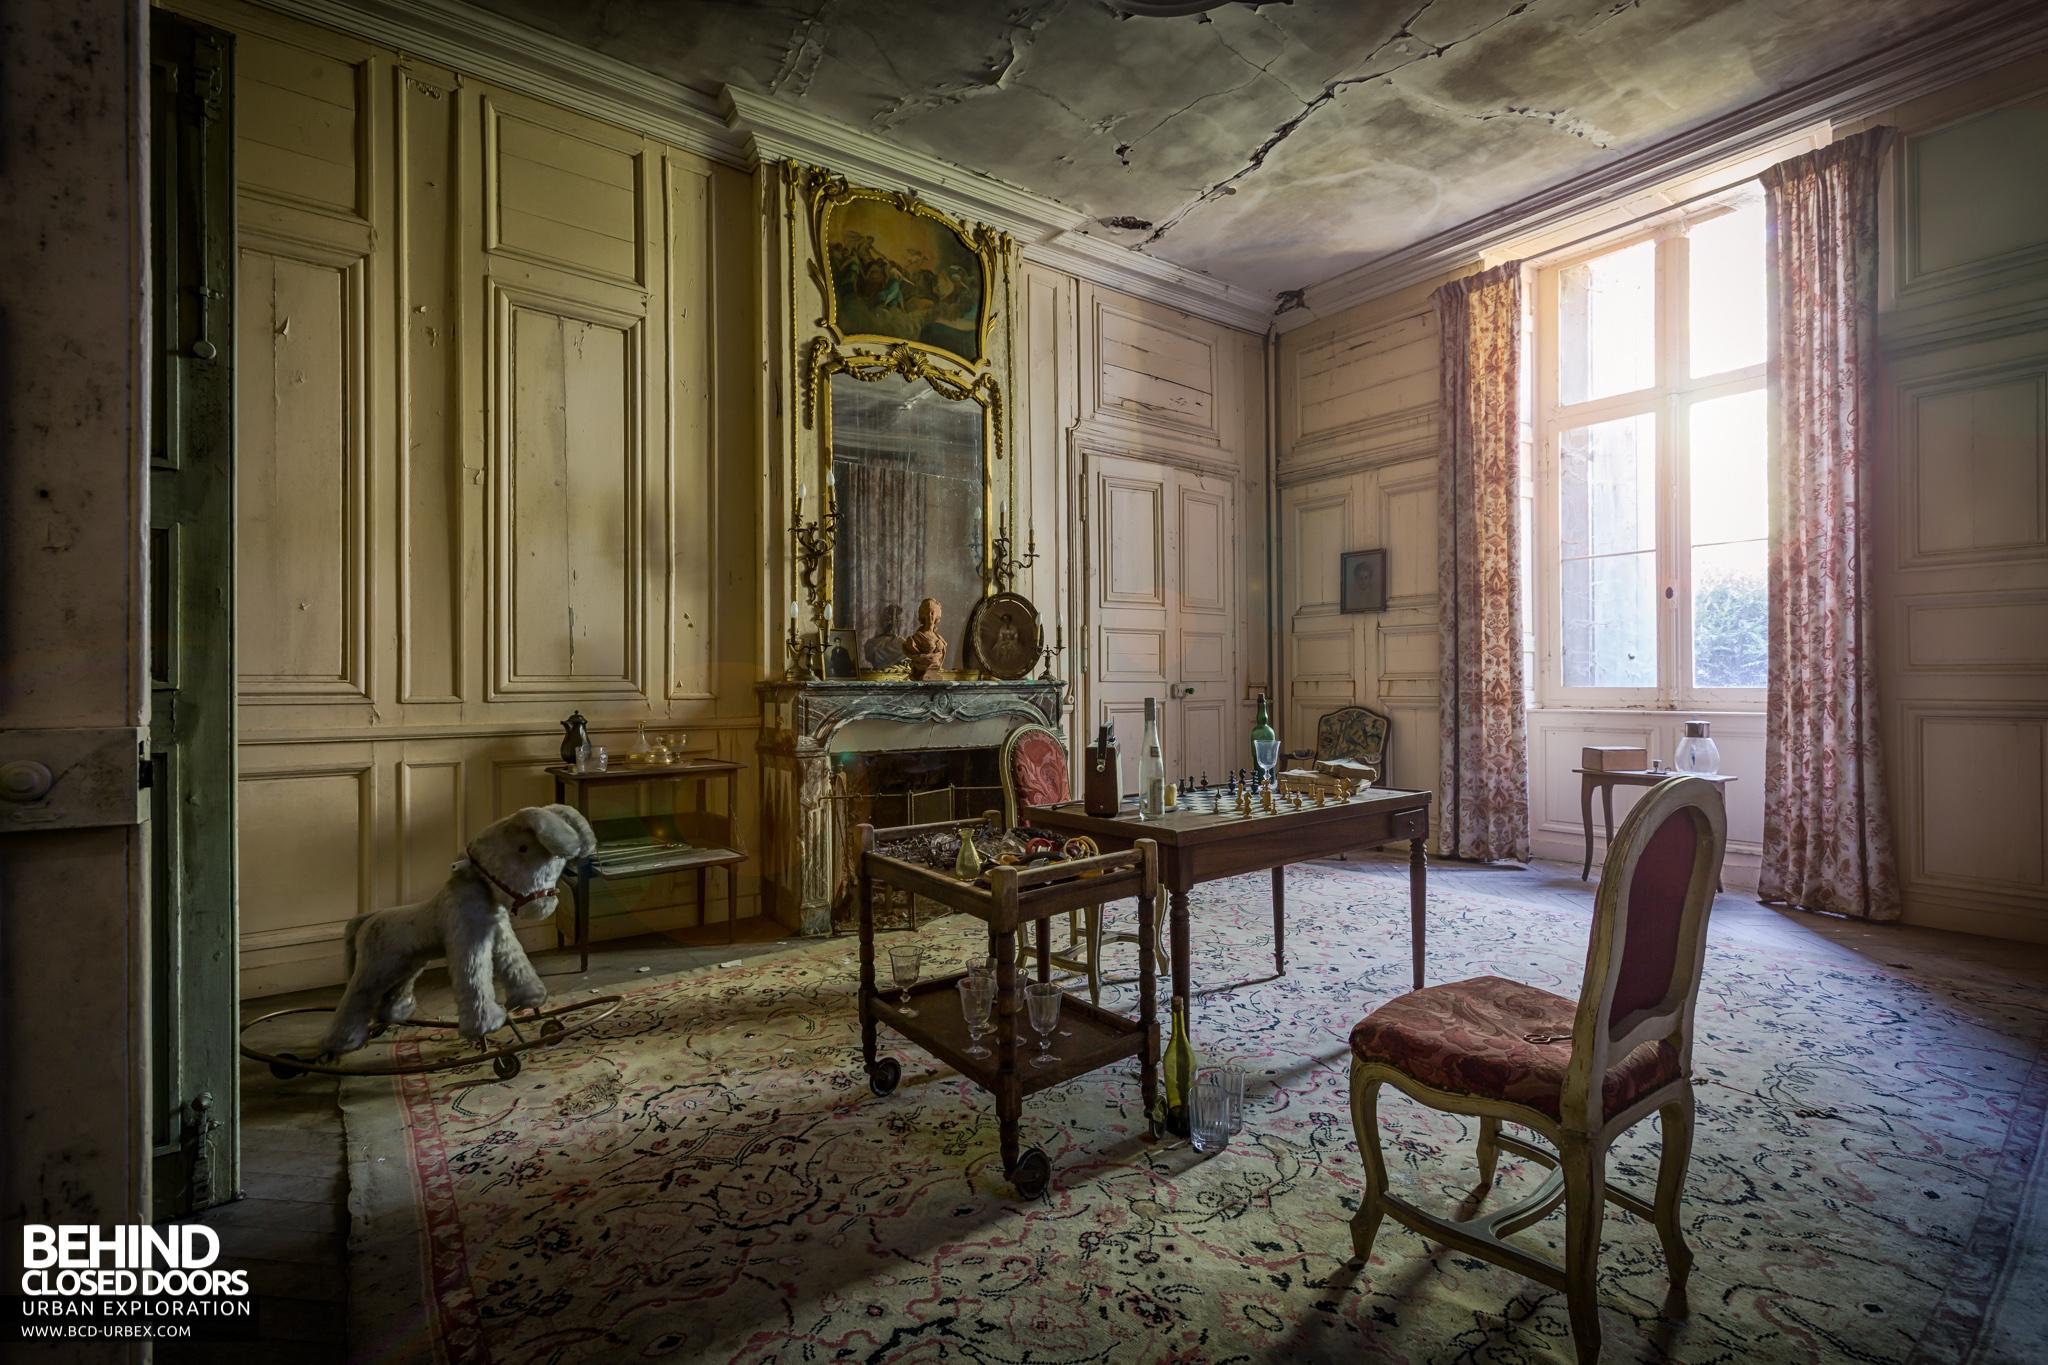 chateau-french-house-7.jpg